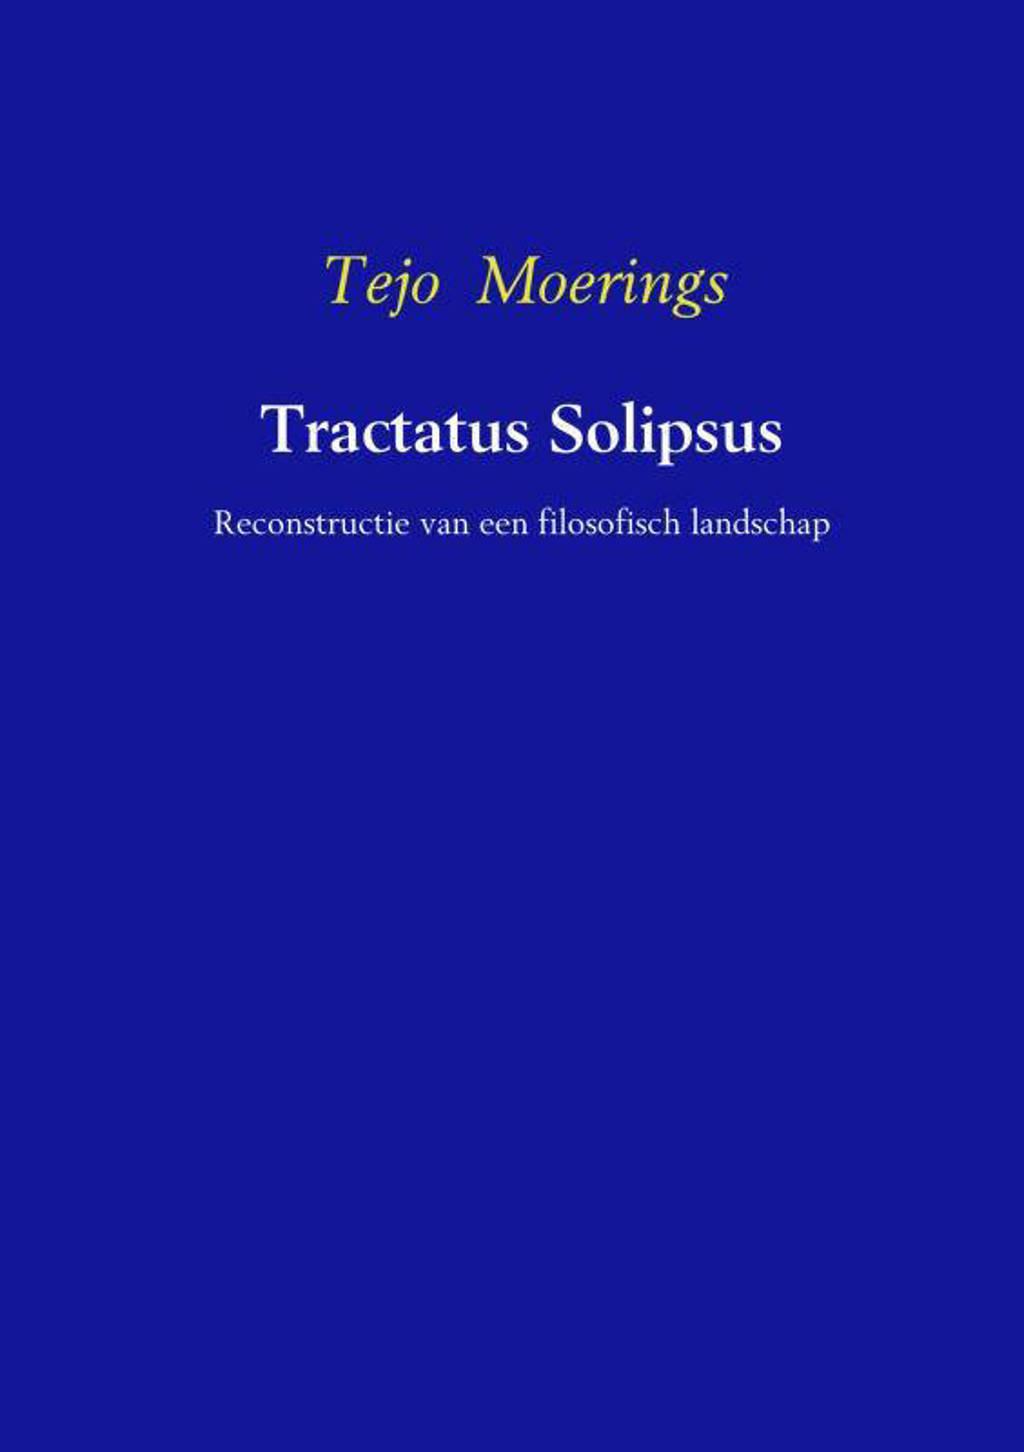 Tractatus Solipsos - Tejo Moerings